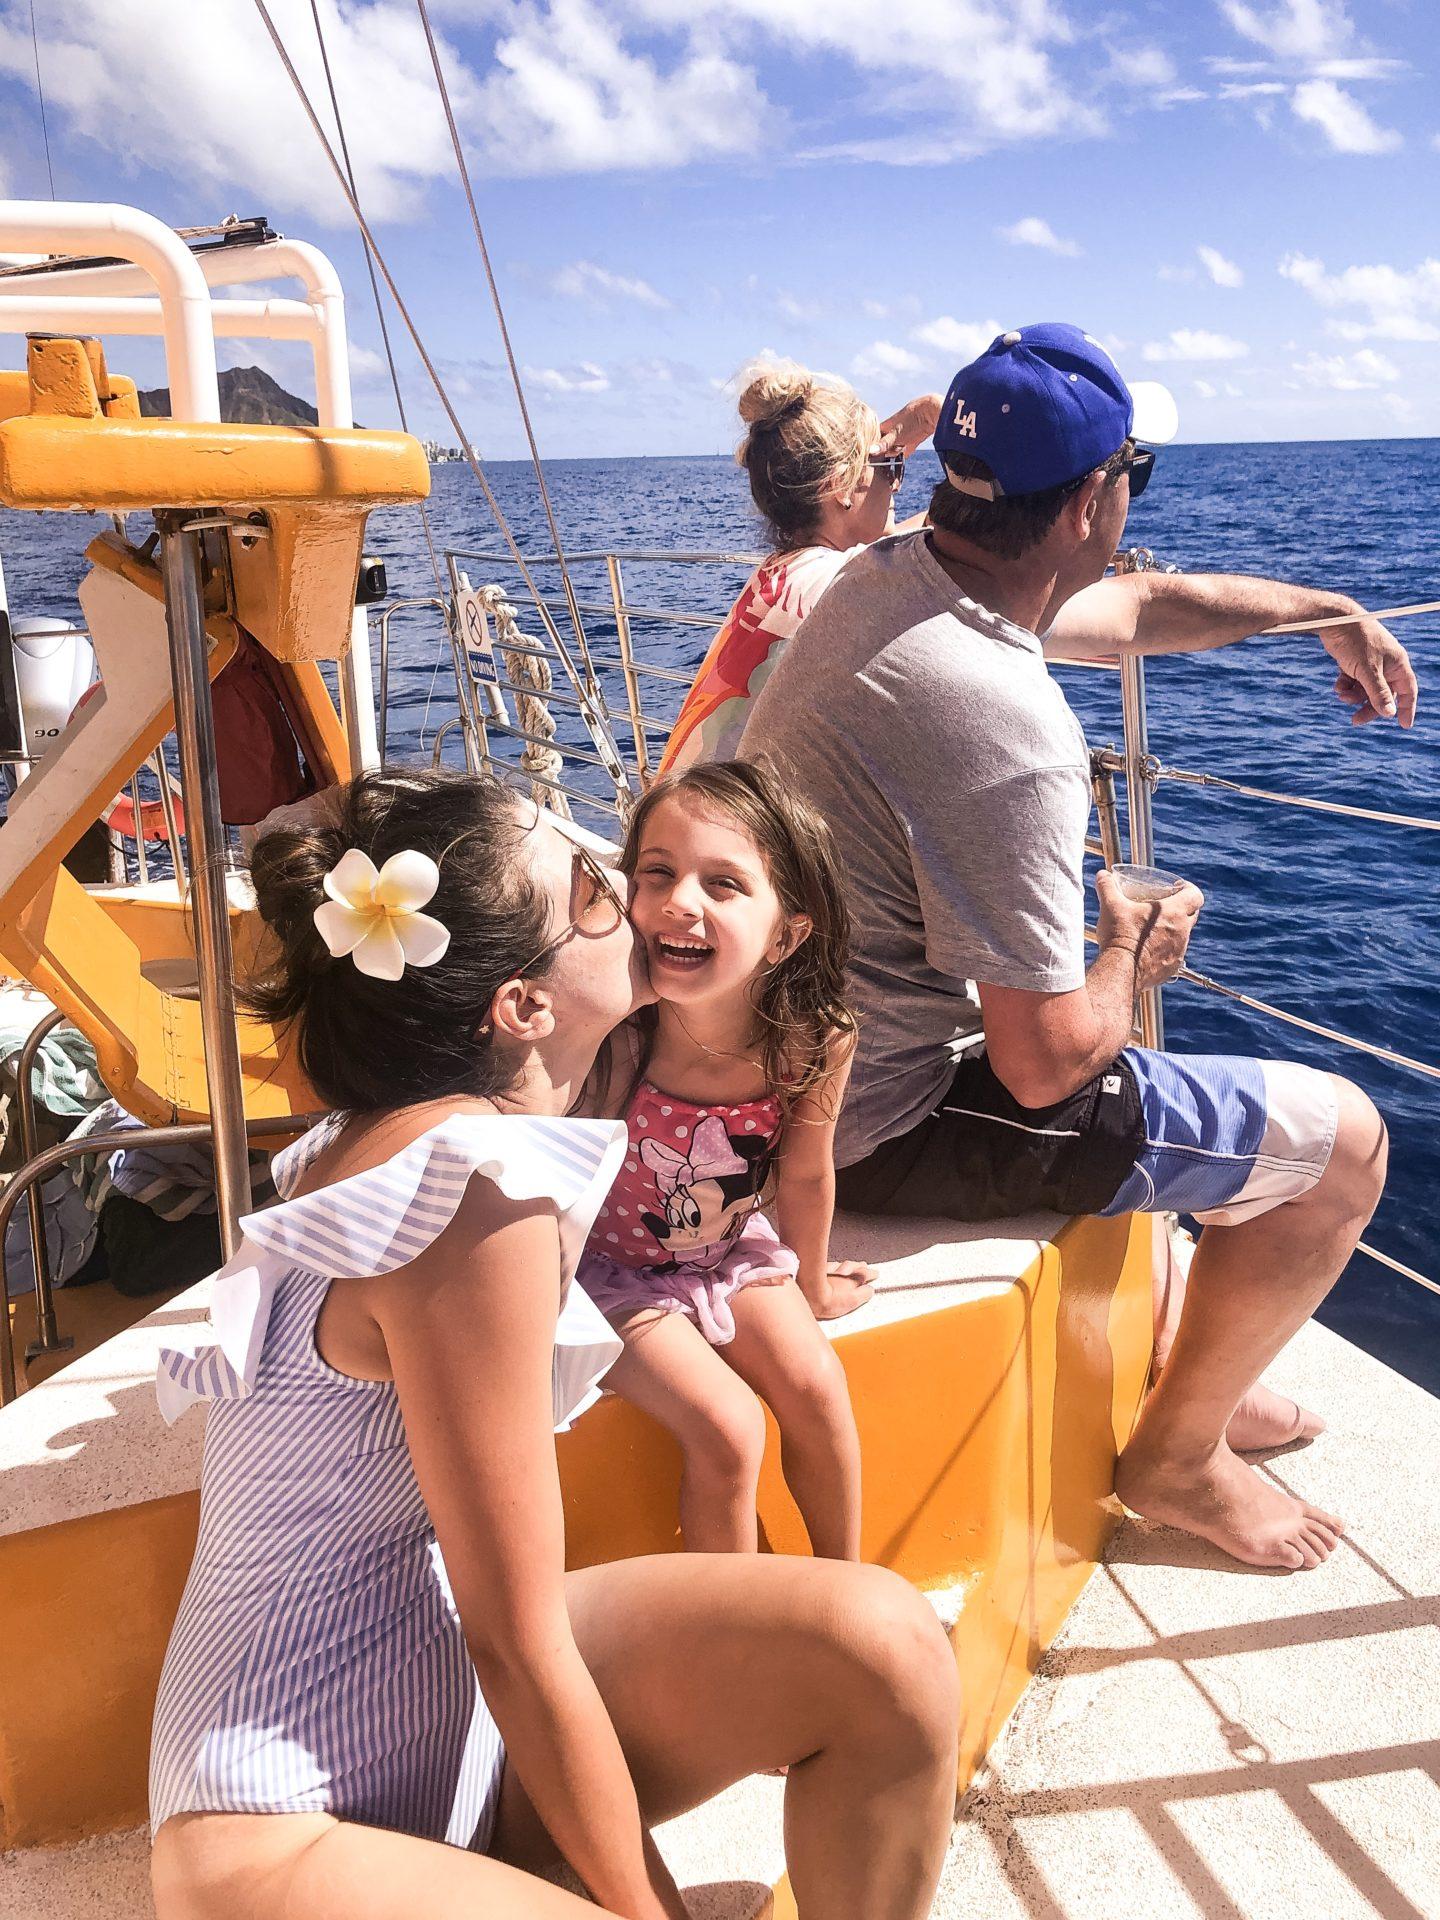 Catamaran Boat Tour Waikiki Beach- Kid Friendly Activities Oahu